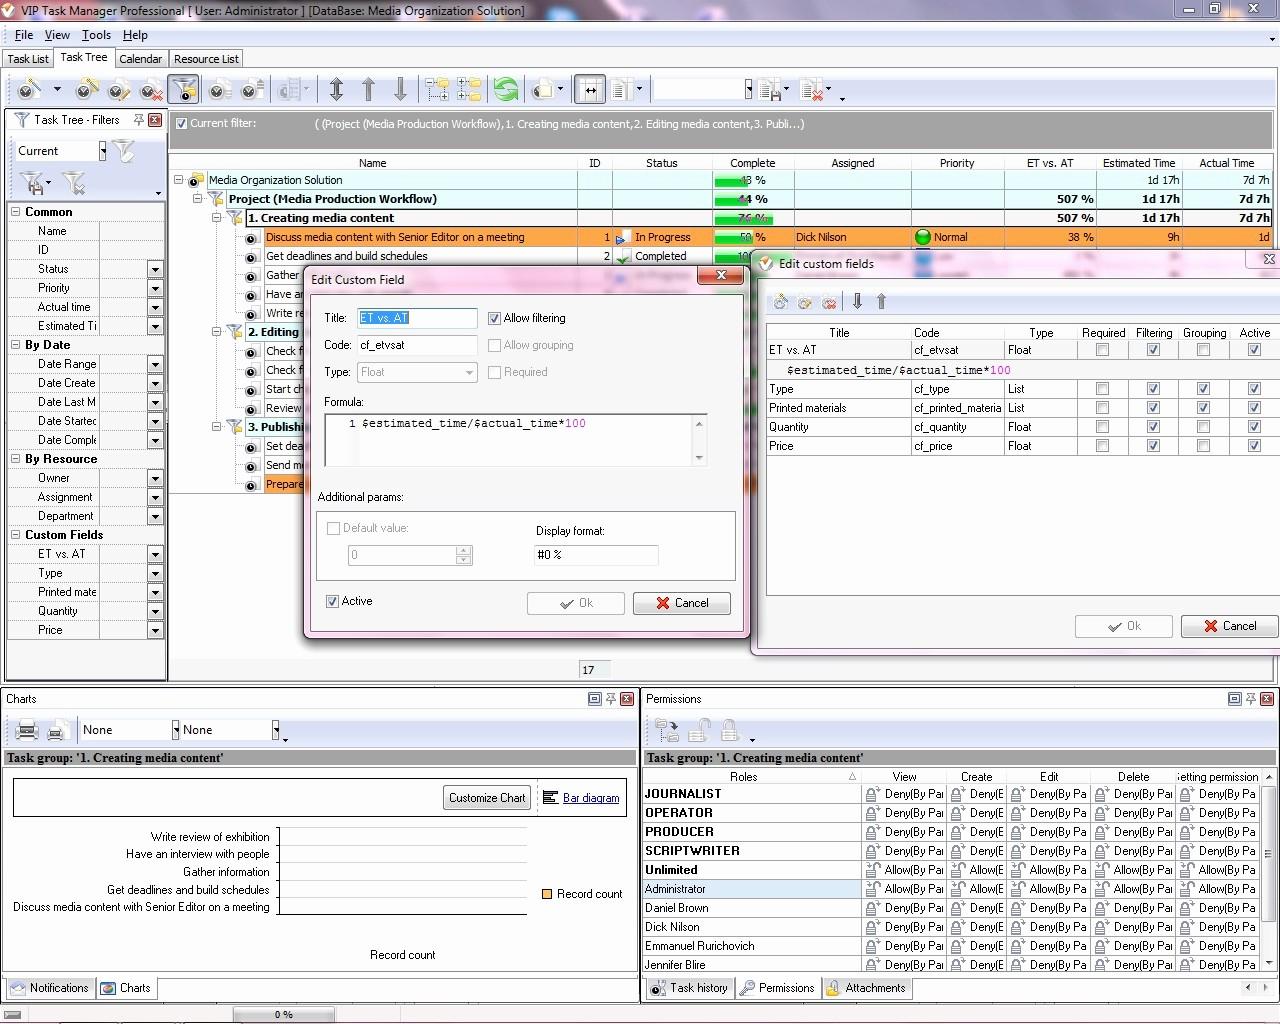 Excel Template for Tracking Tasks Best Of Excel Spreadsheet for Tracking Tasks D Workbook